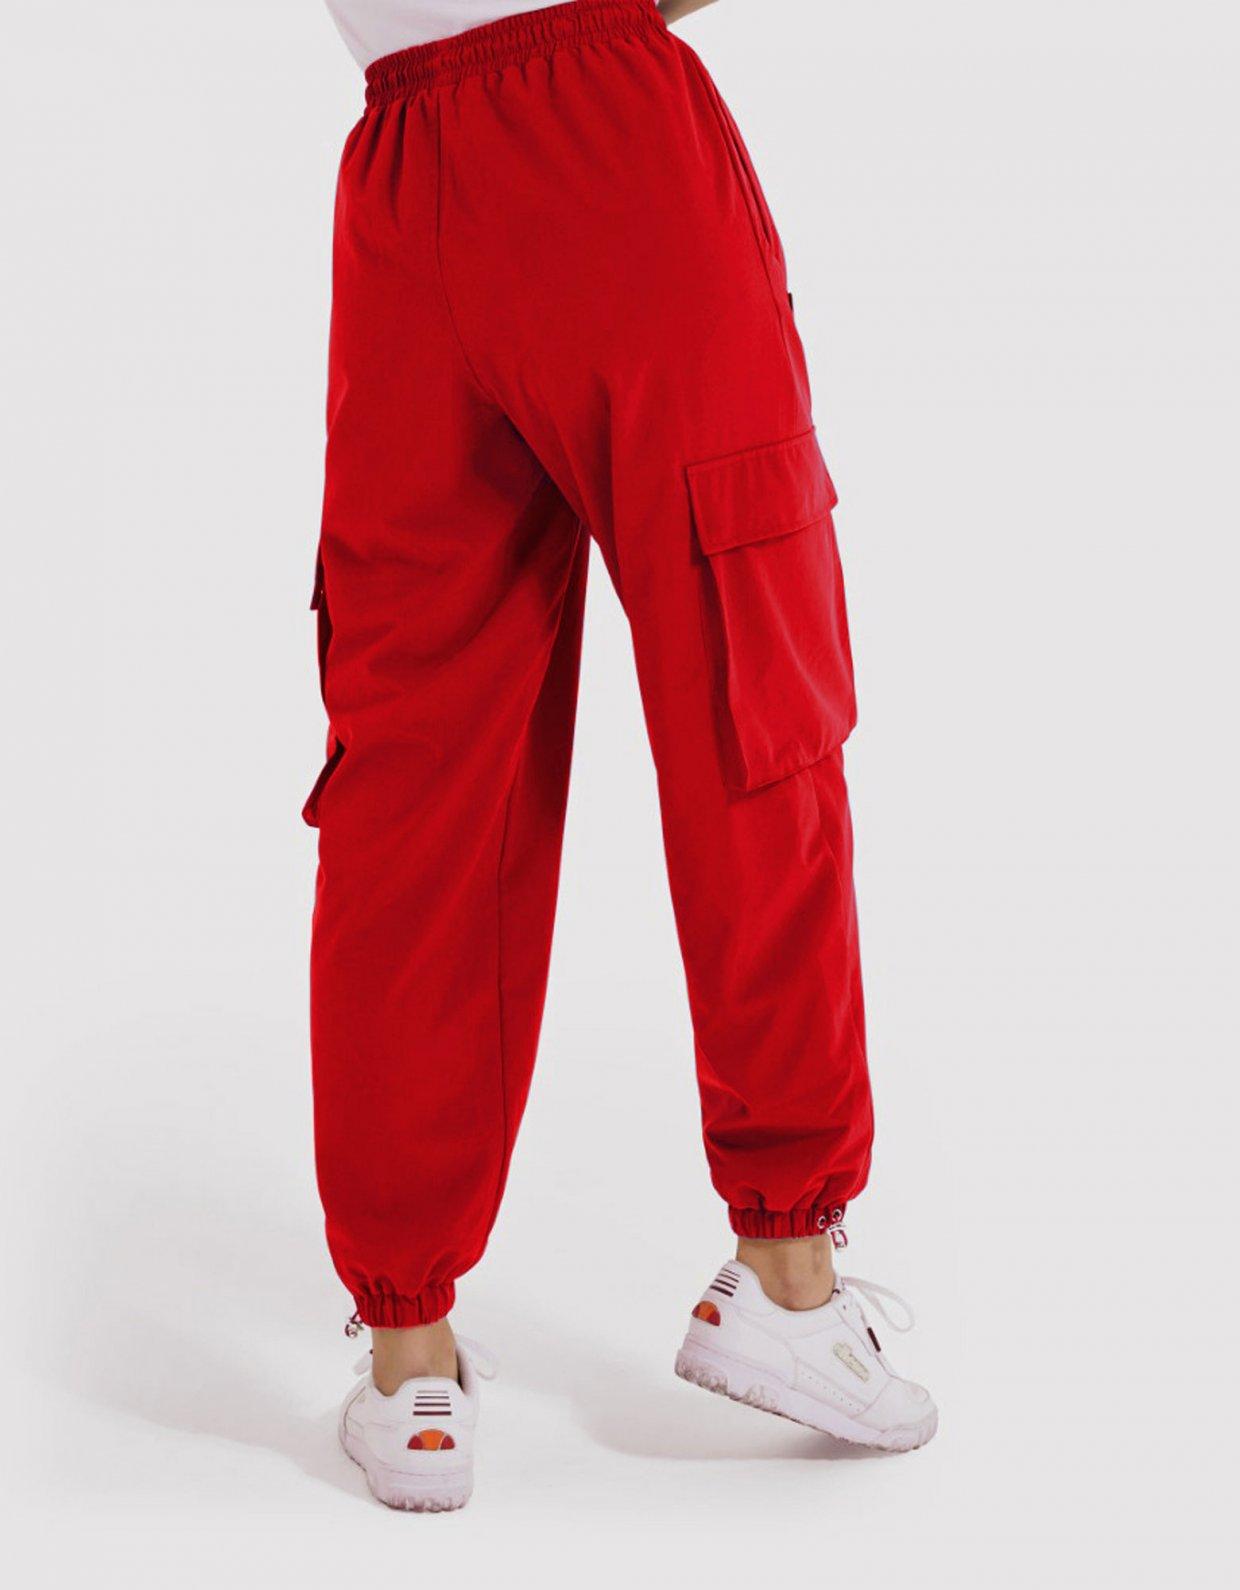 Ellesse Rosana track pants red